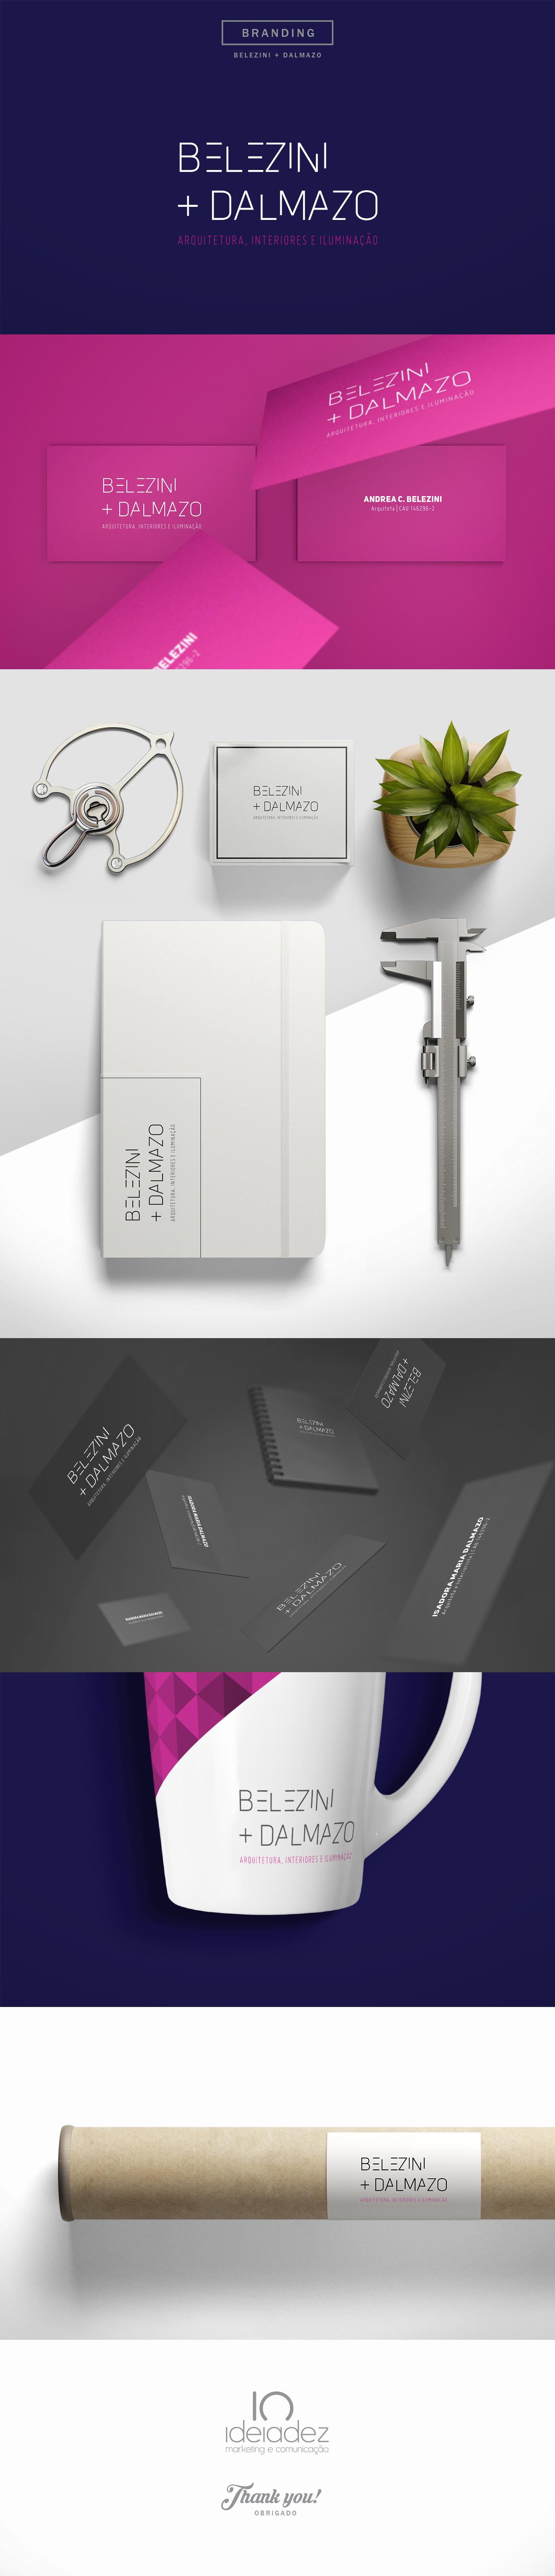 logo brandingdesign brandingmockup Mockup #ArchitectureBranding stationary